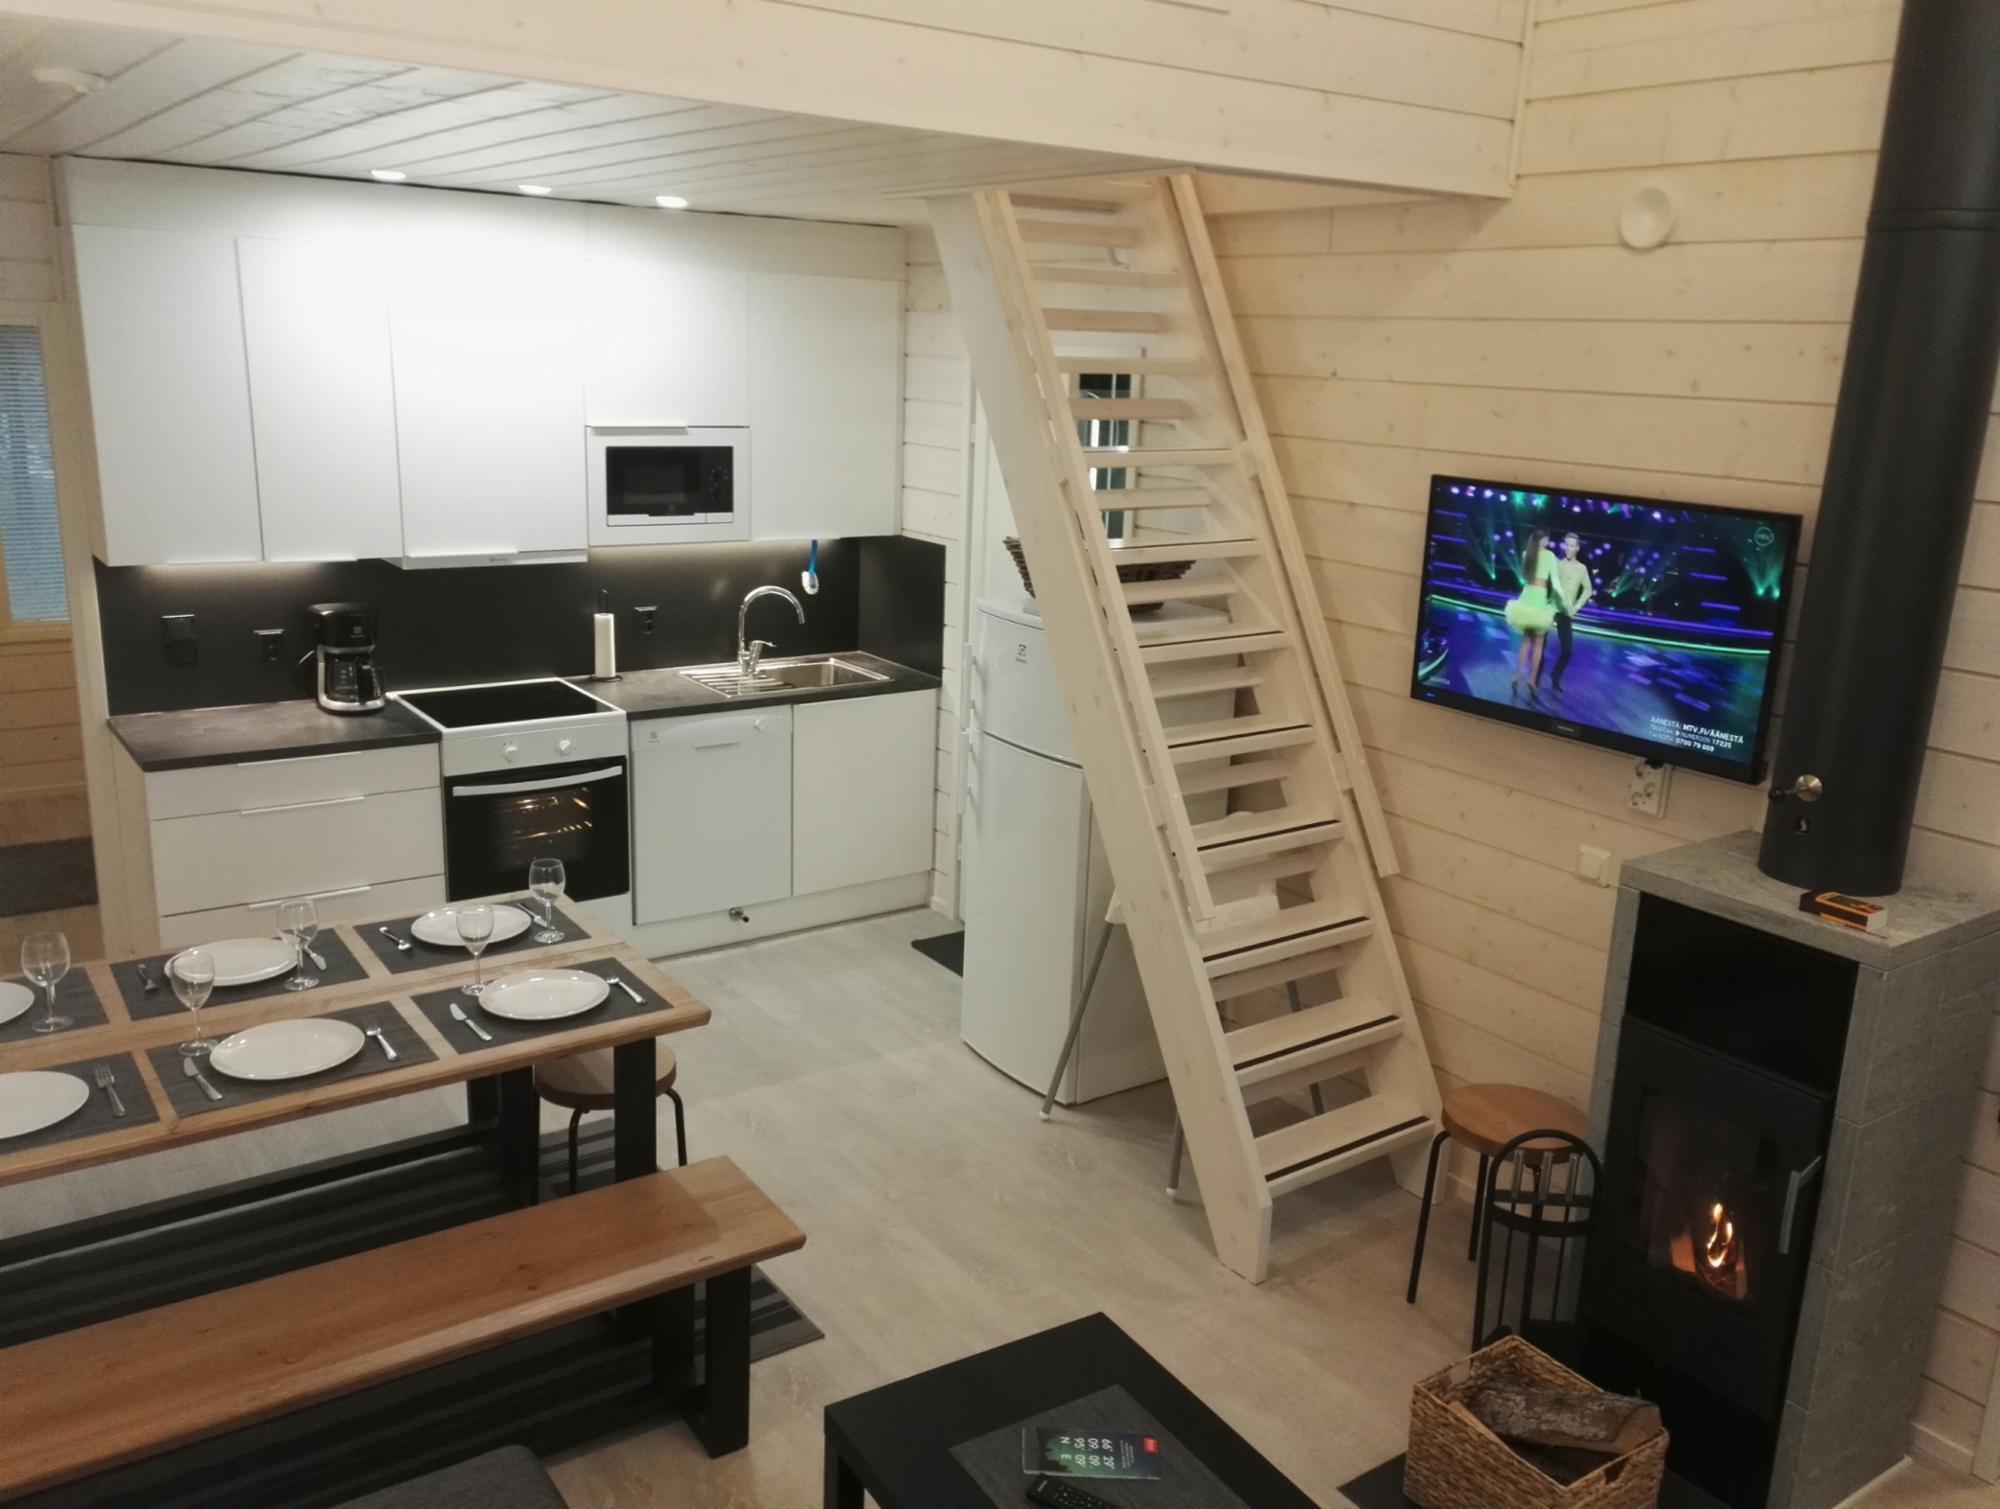 Rukantrio A 47+30 m2 (7 pers.)East-Ruka Vuosseli